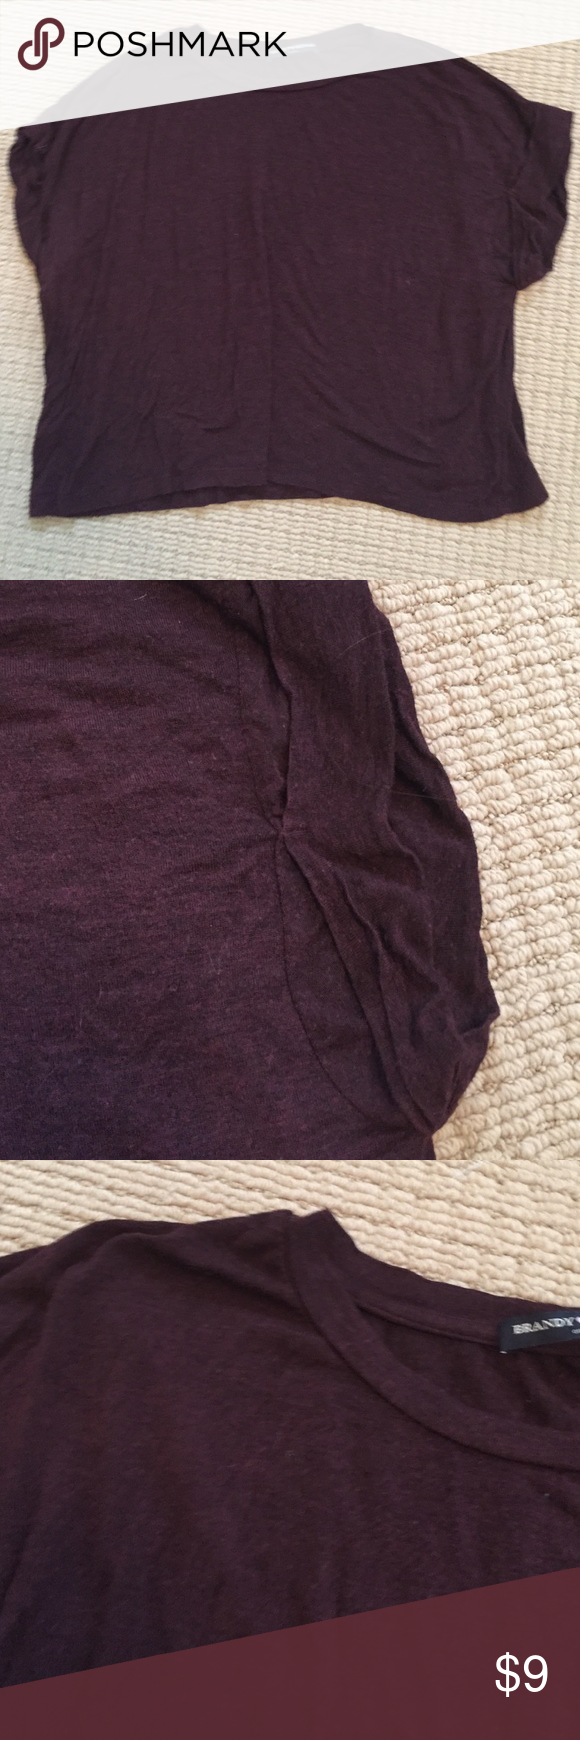 Cute soft Brandy Melville cap sleeve tee Brandy Melville cap sleeve burgundy tee. See pictures for sleeve detail Brandy Melville Tops Tees - Short Sleeve